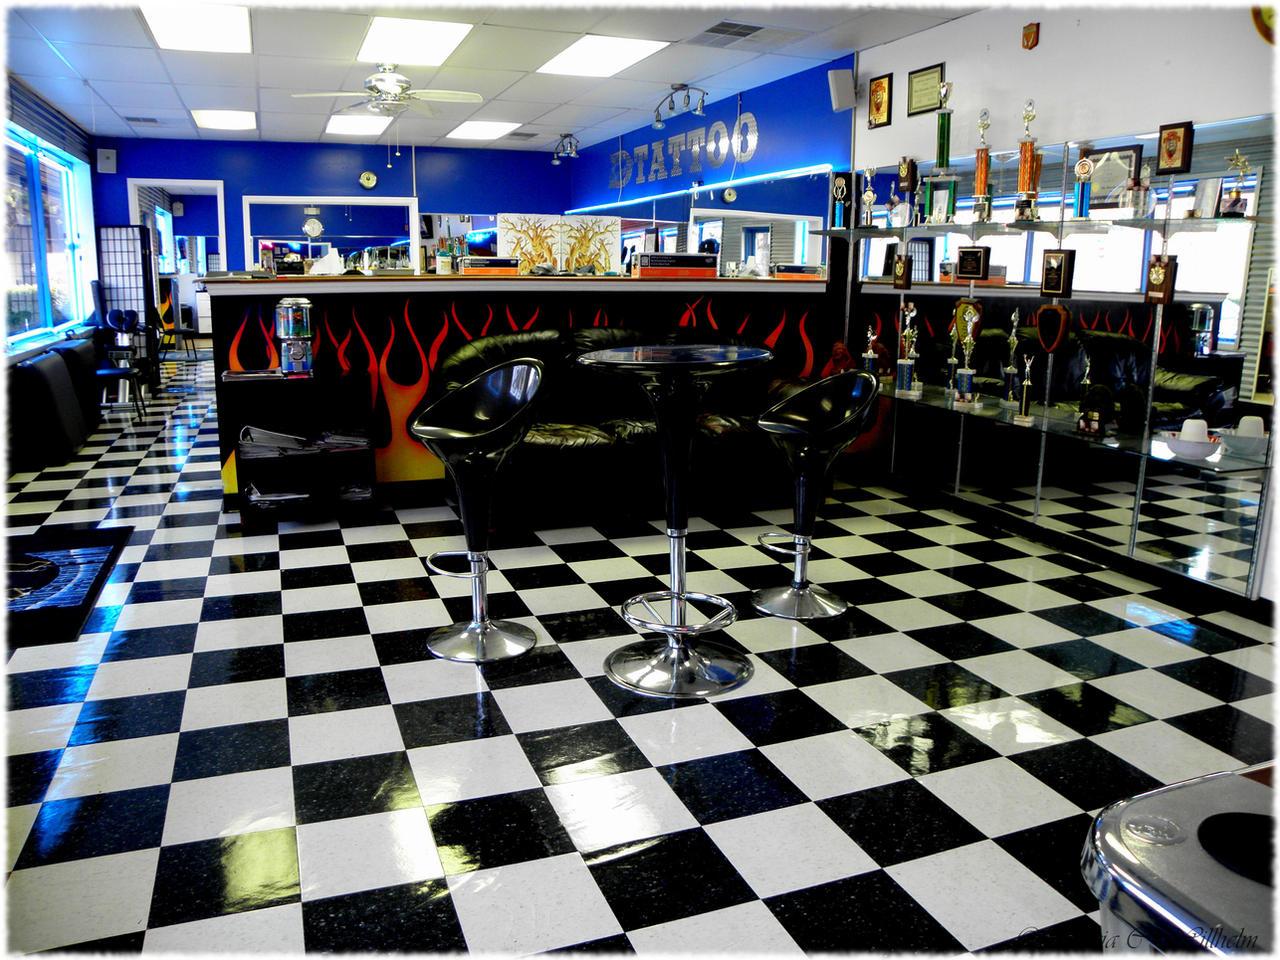 tatoo art designs photos tatoo shops designs photos pics wallpapers 2013. Black Bedroom Furniture Sets. Home Design Ideas